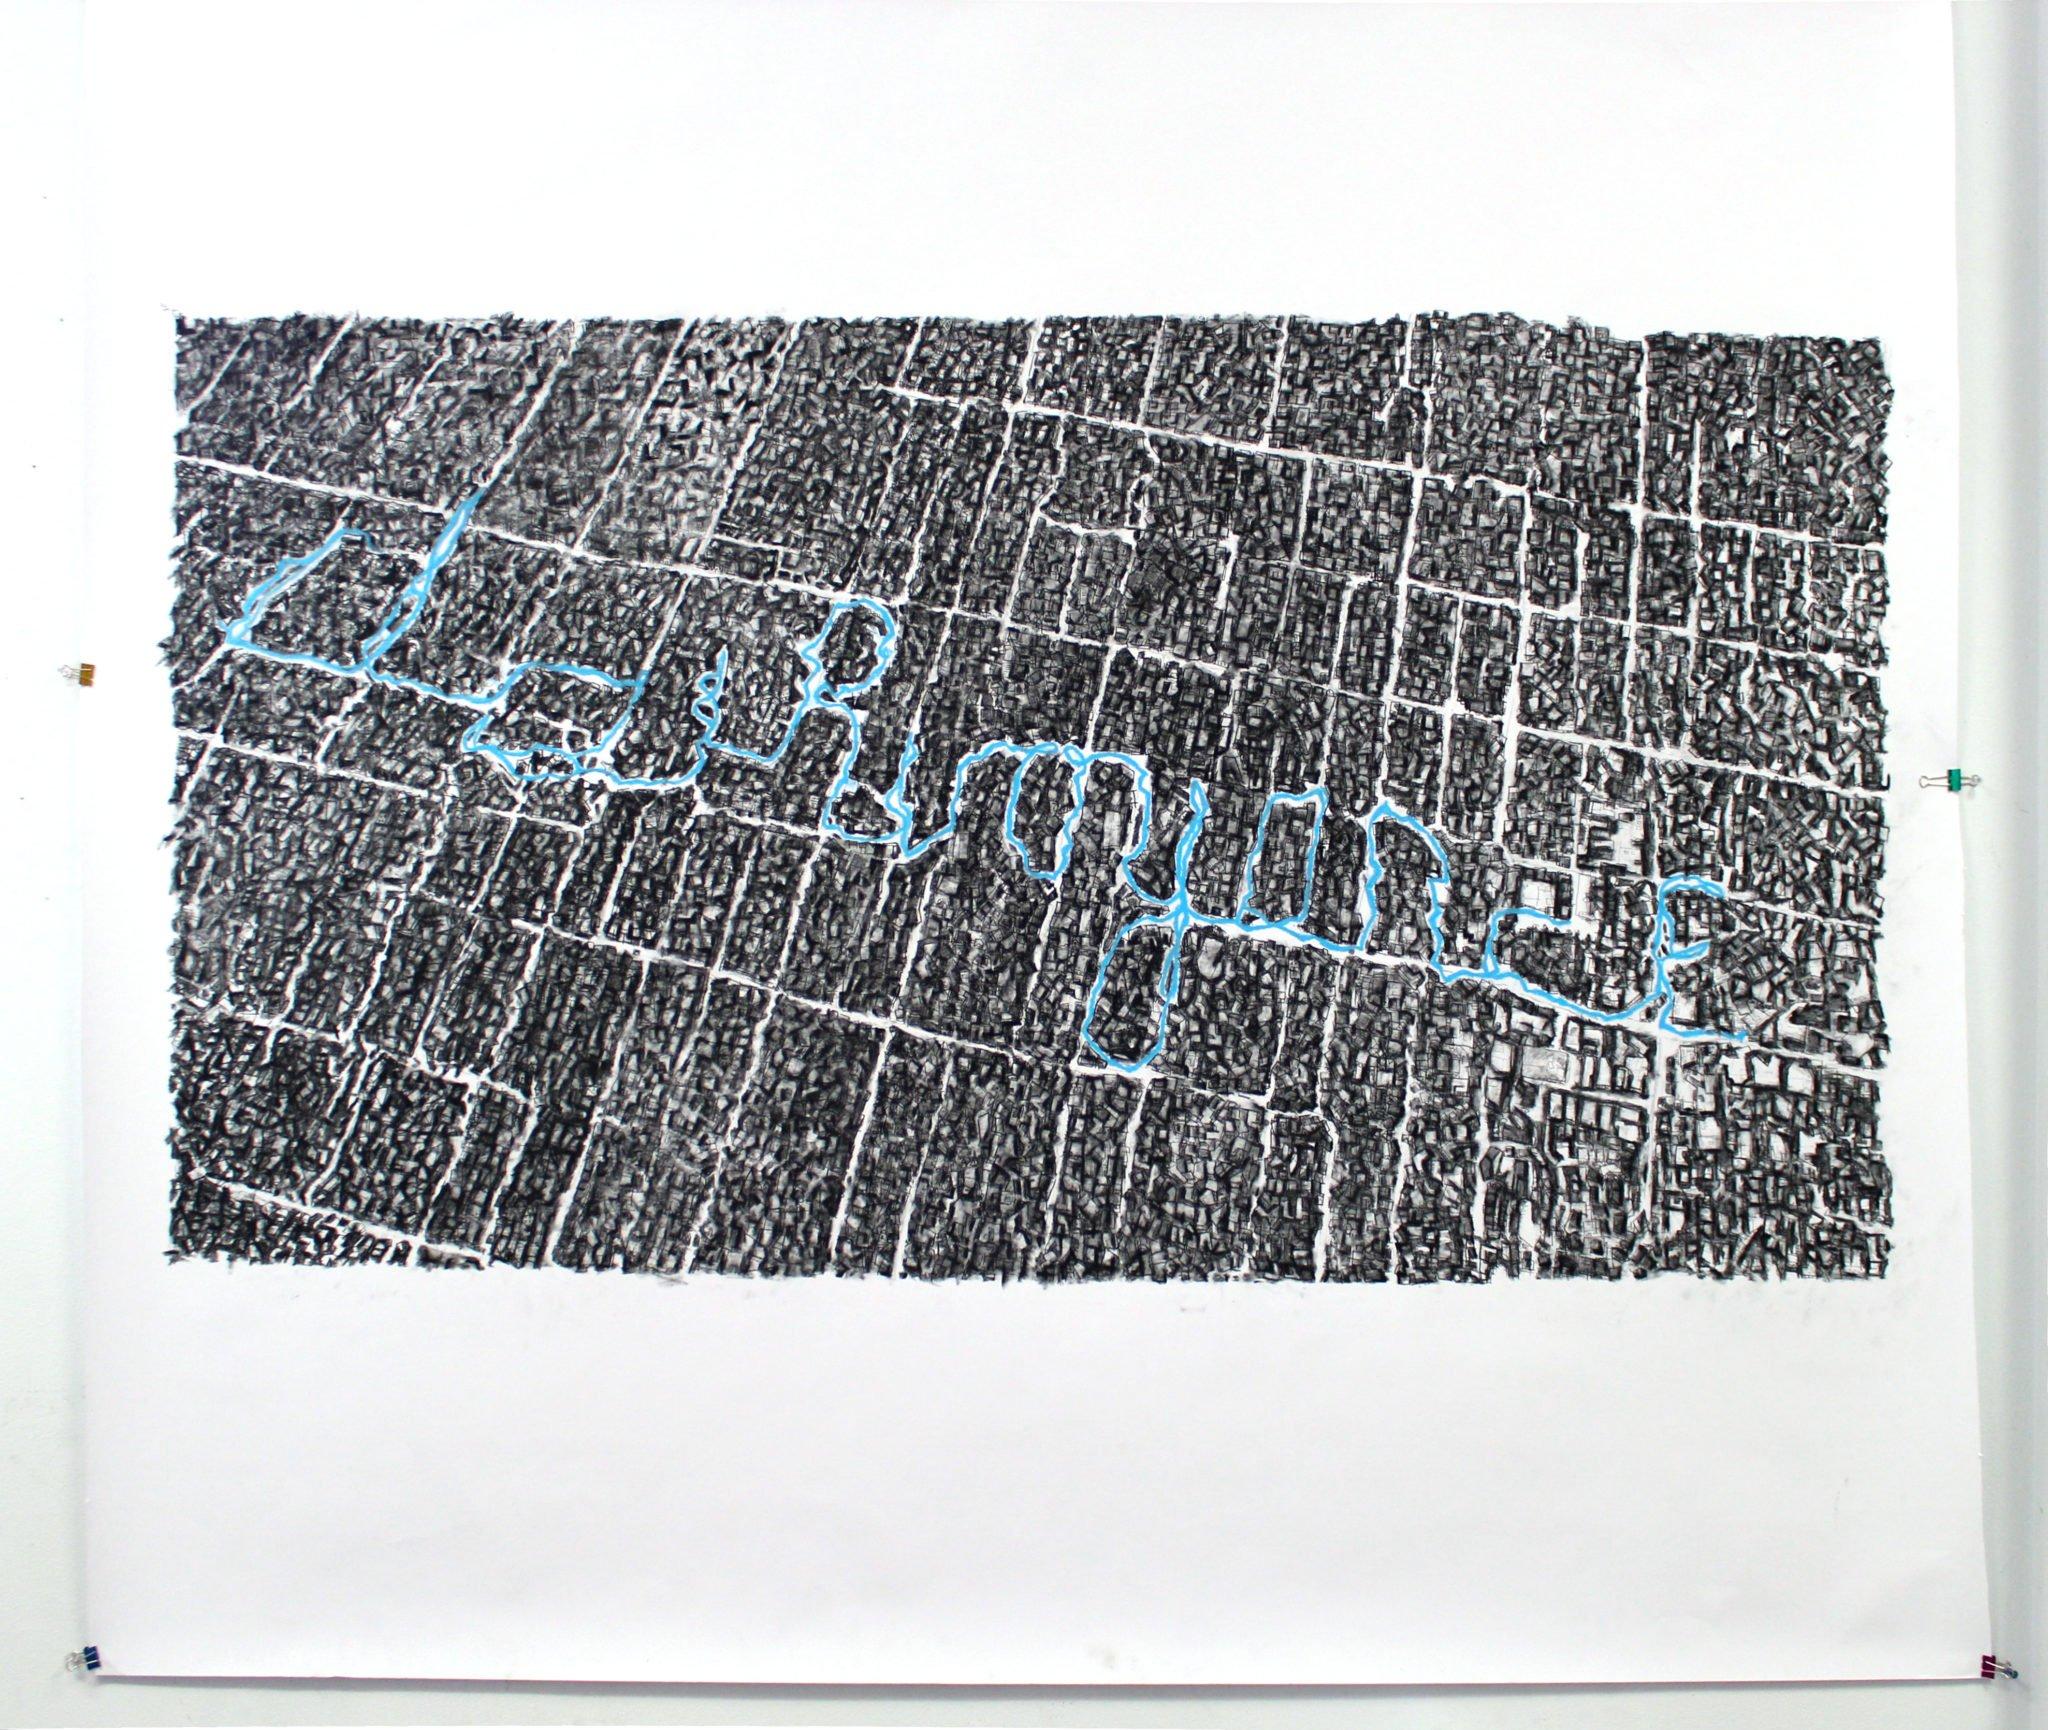 "Clairvoyance (first walk)  |  pastel on paper  |  60"" x 66""  |  2011"